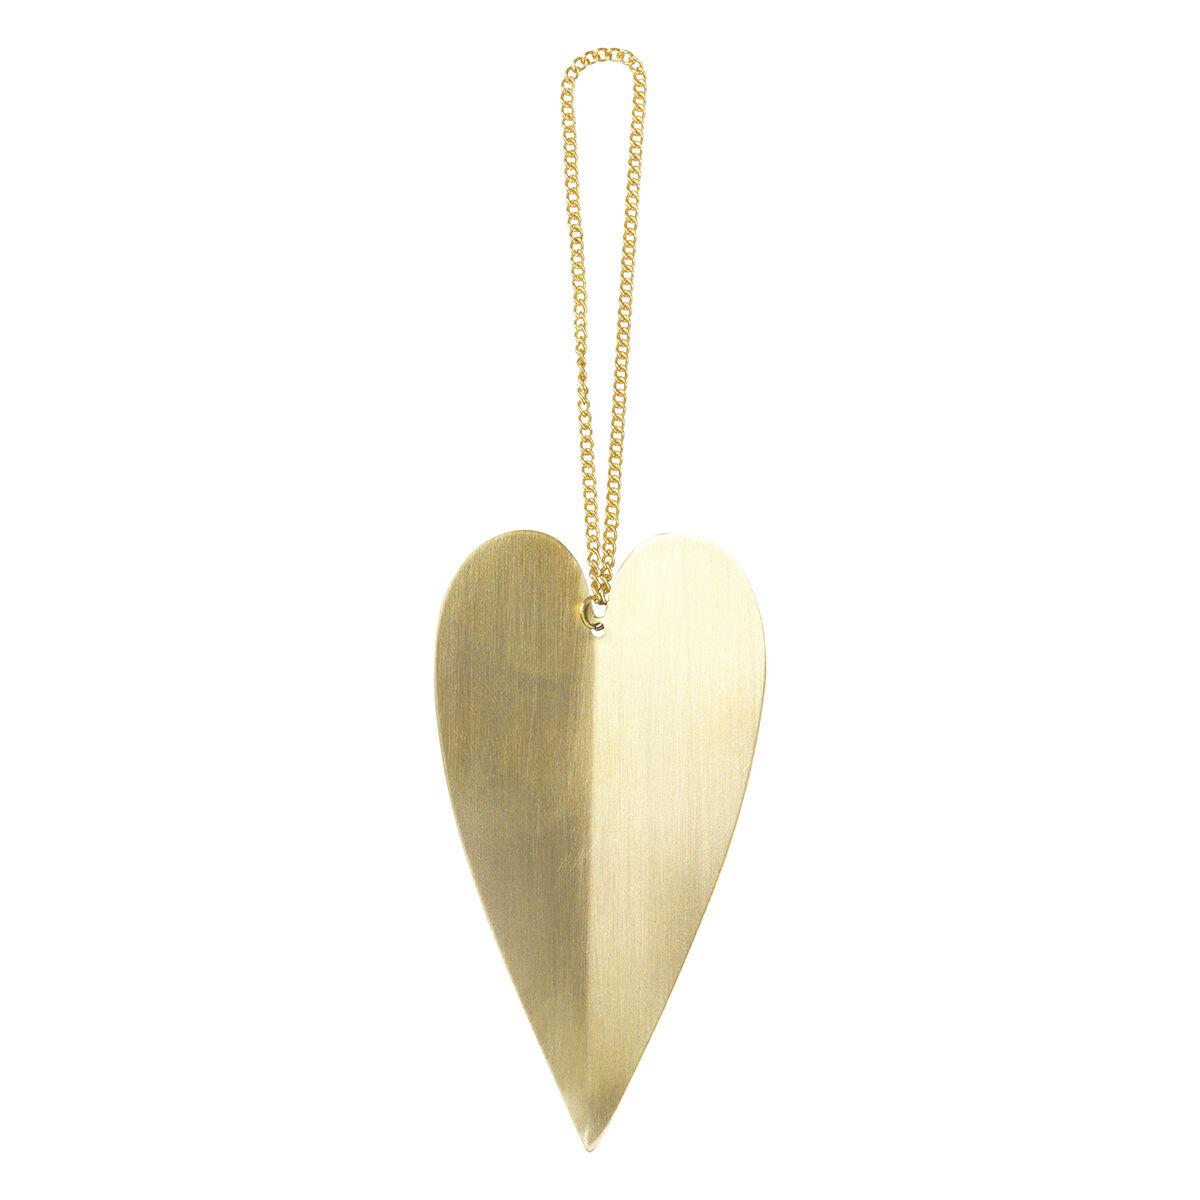 Ferm Living Heart joulukoriste, messinki, 4 kpl